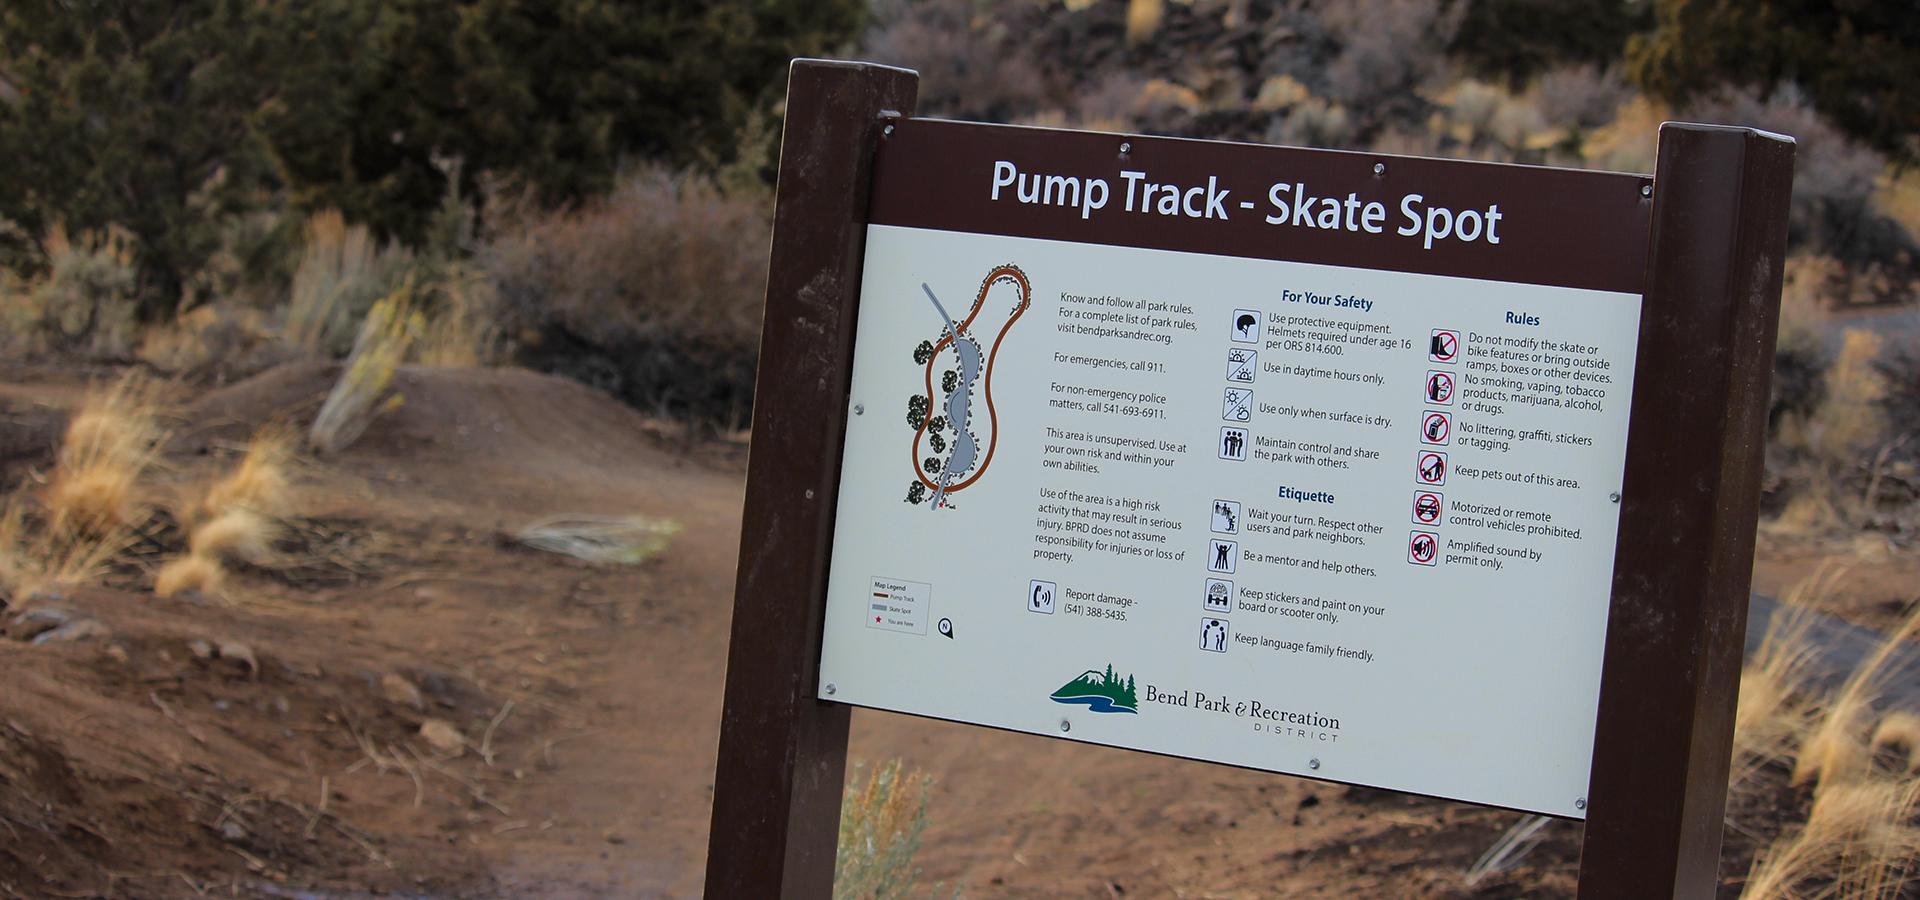 Stone-Creek-Park-Pump-Track-Entrance